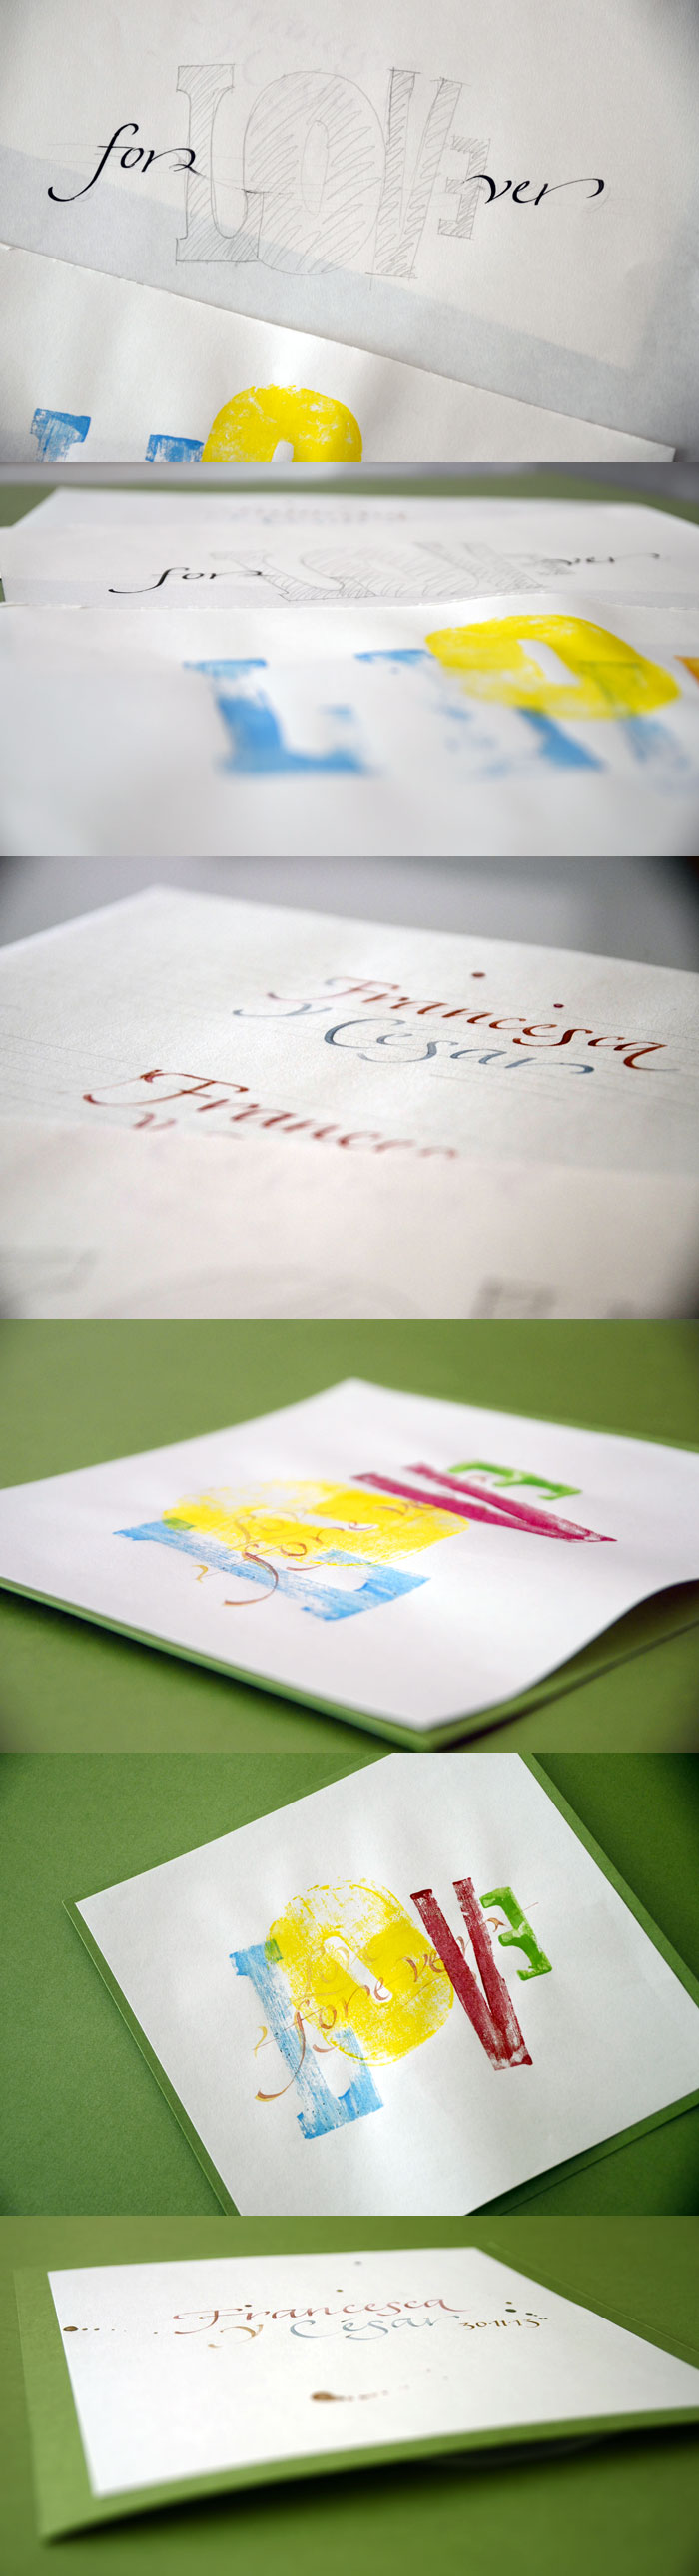 img_baroniodesign_calligrafia